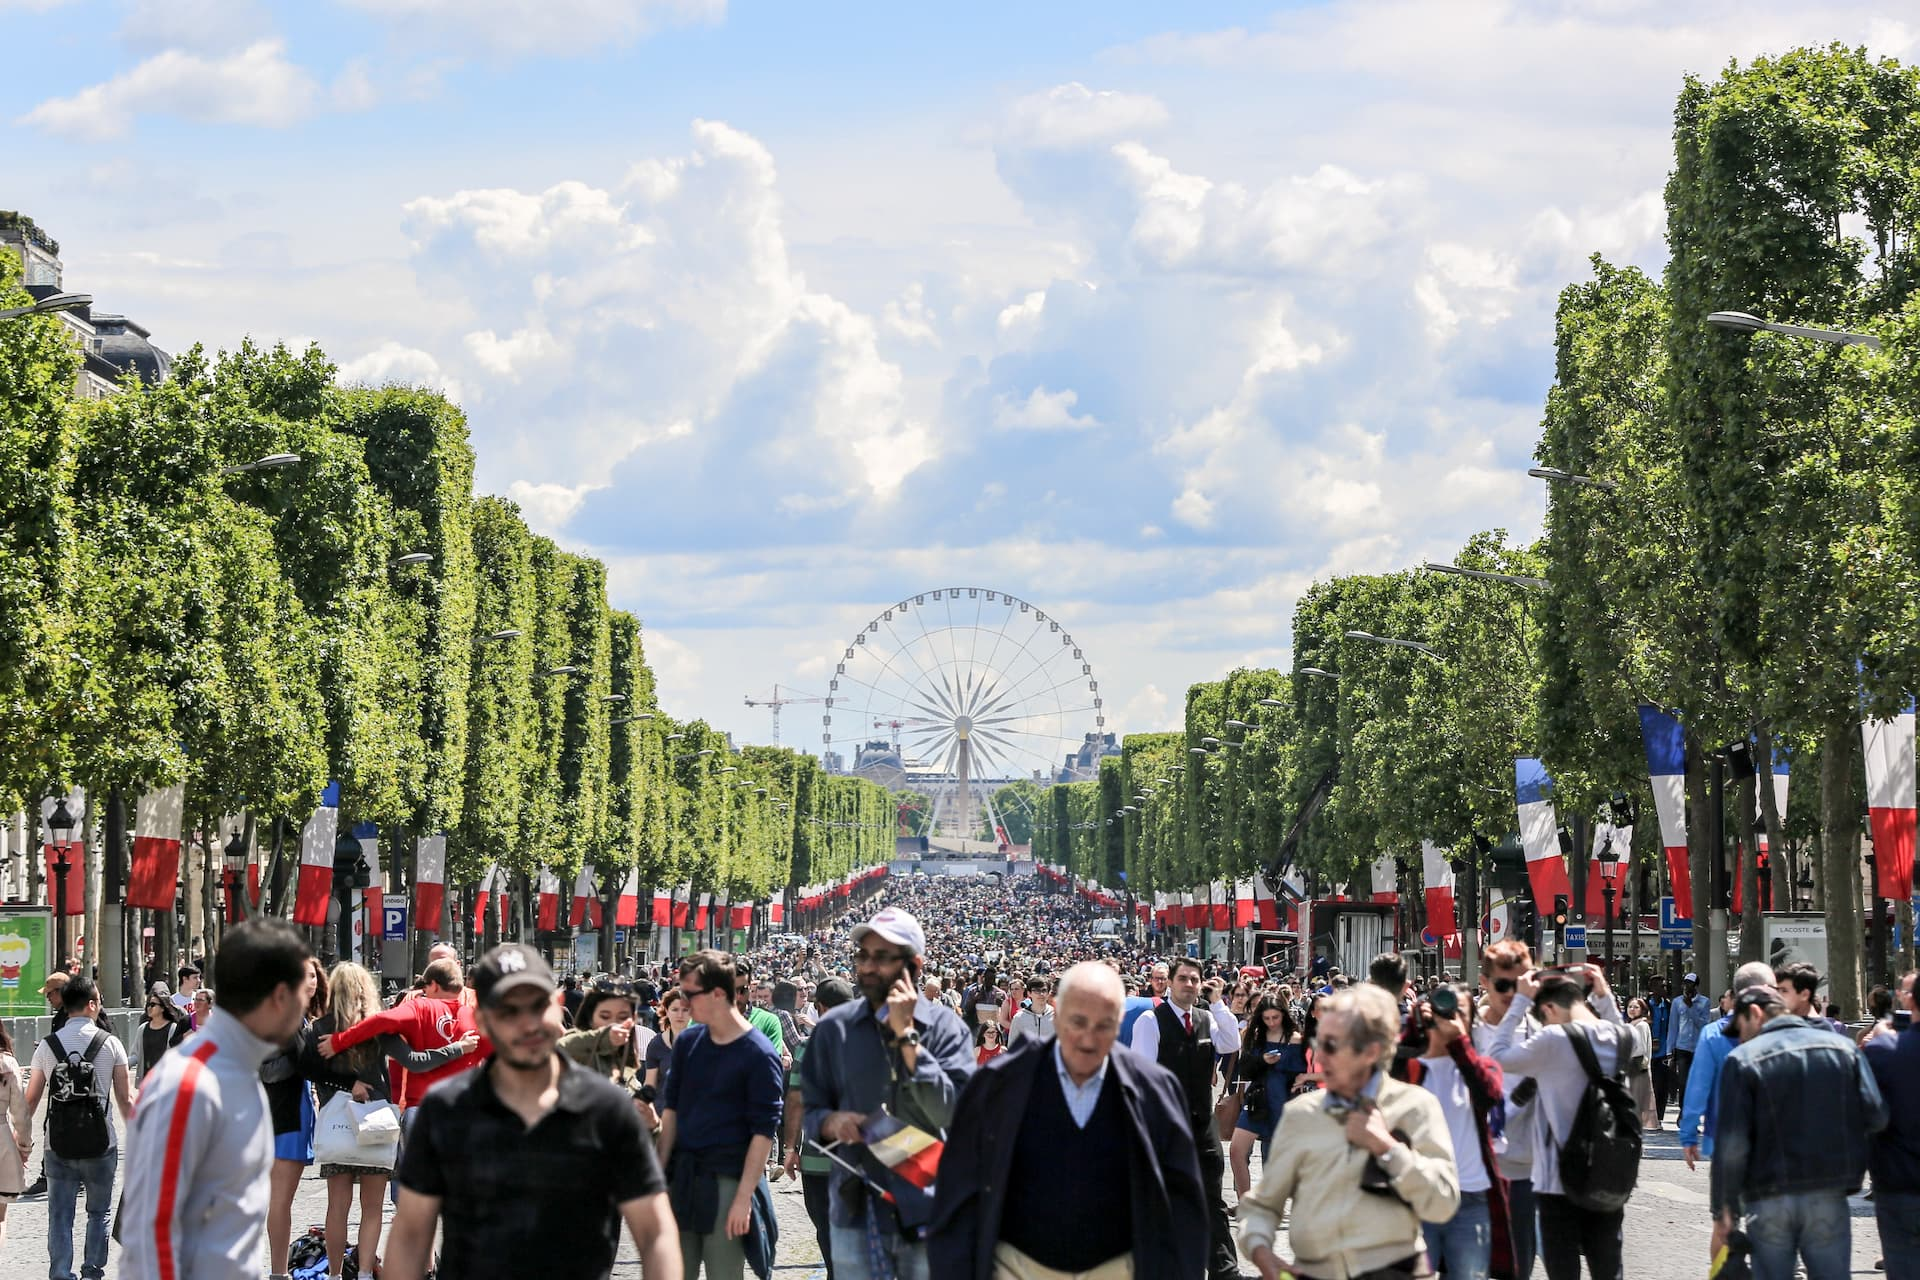 Francezii sărbătoresc Ziua Bastiliei pe Champs Élysées